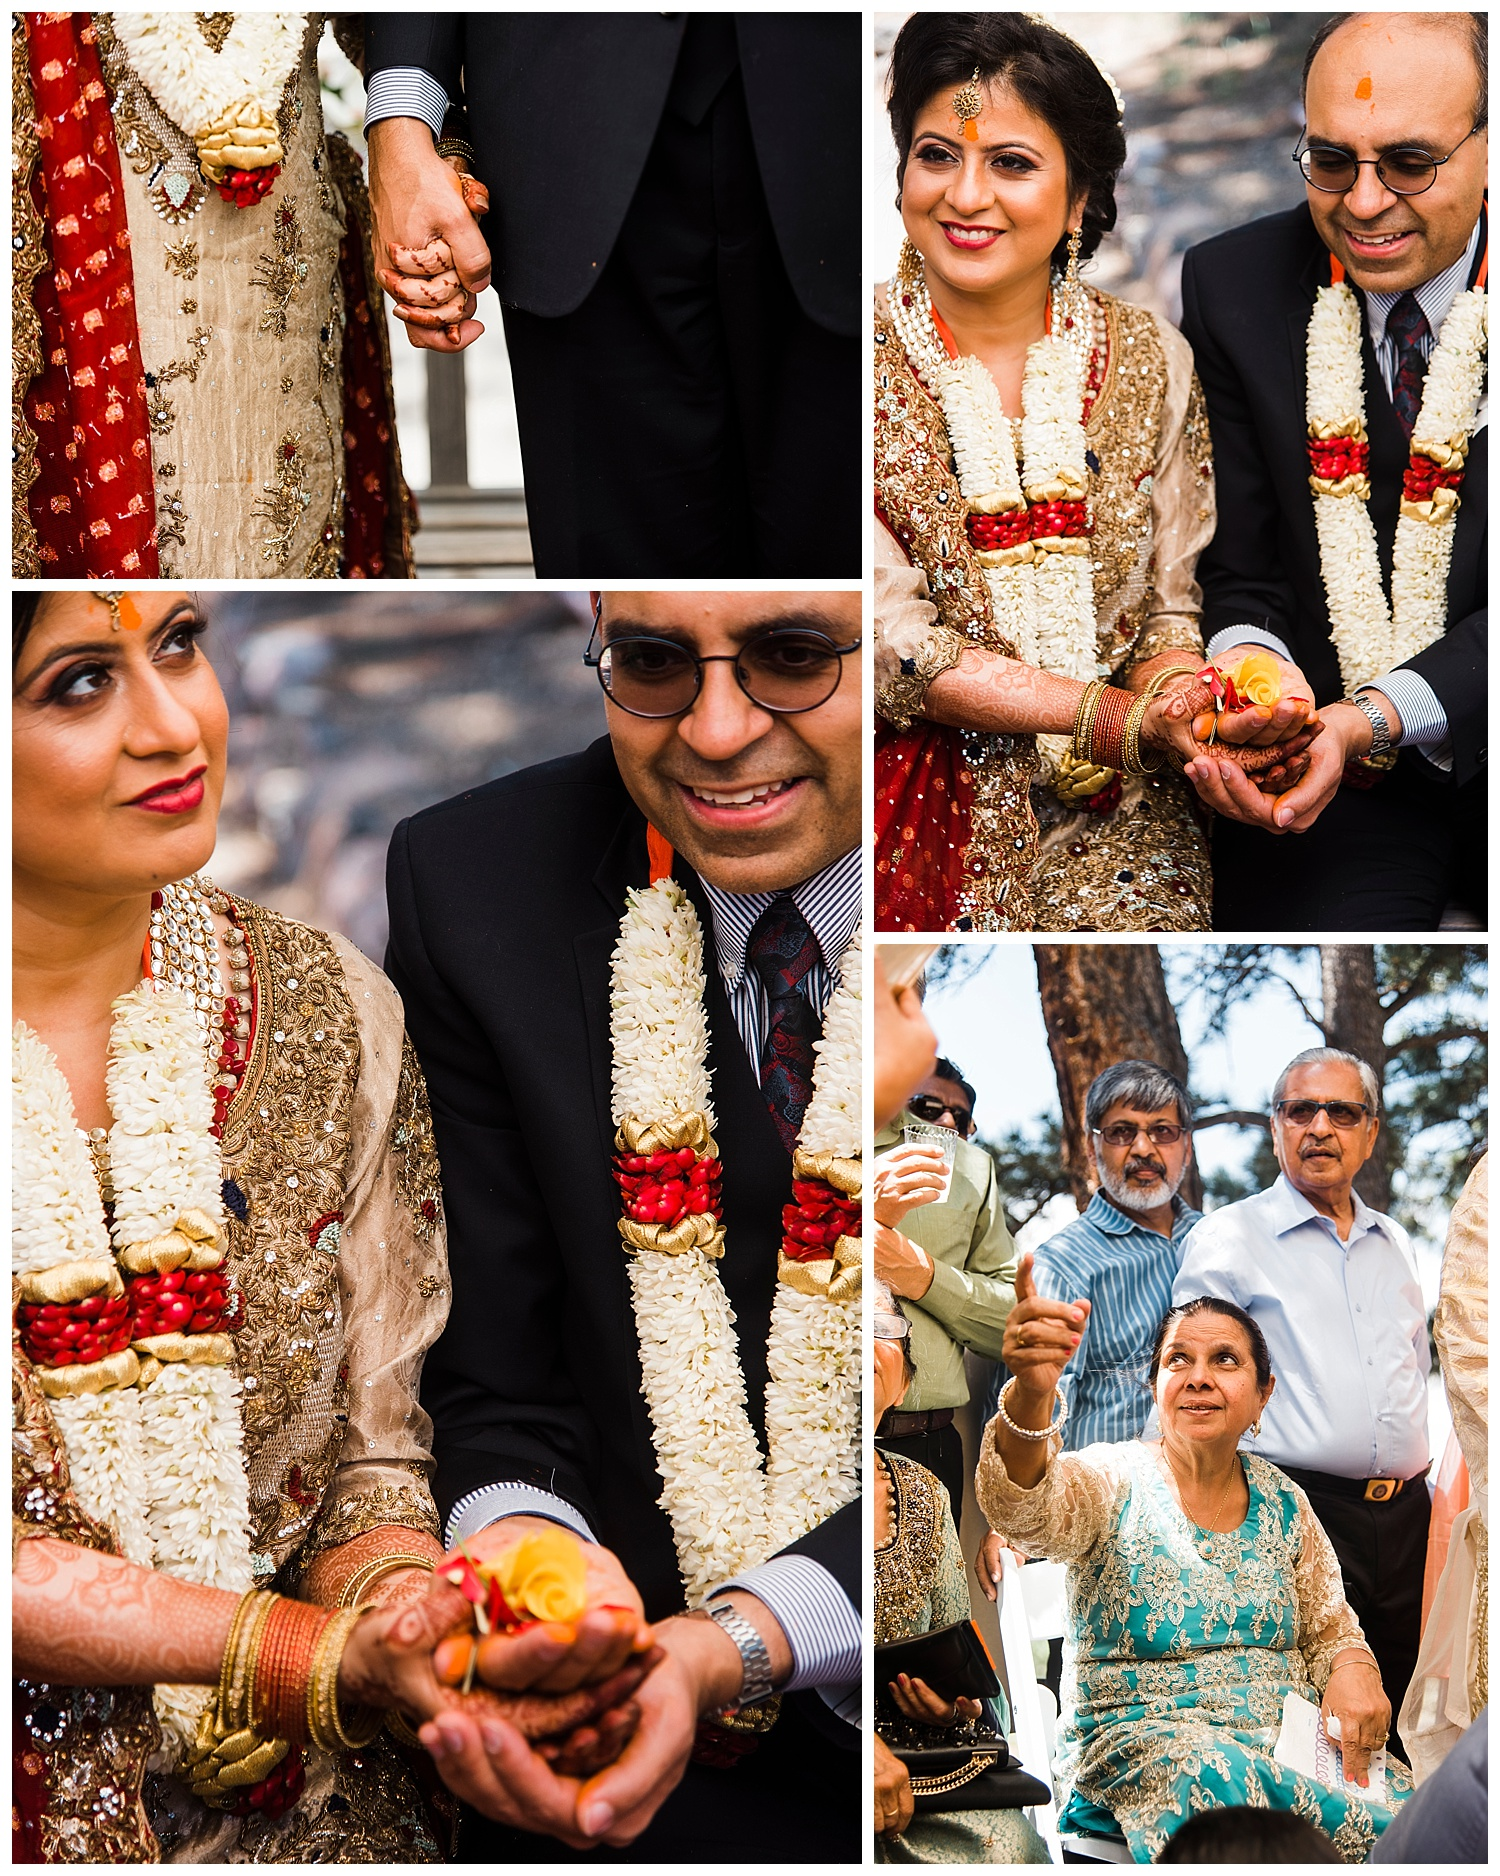 Hindu_Wedding_NYC_Photographer_Apollo_Fields_160.jpg